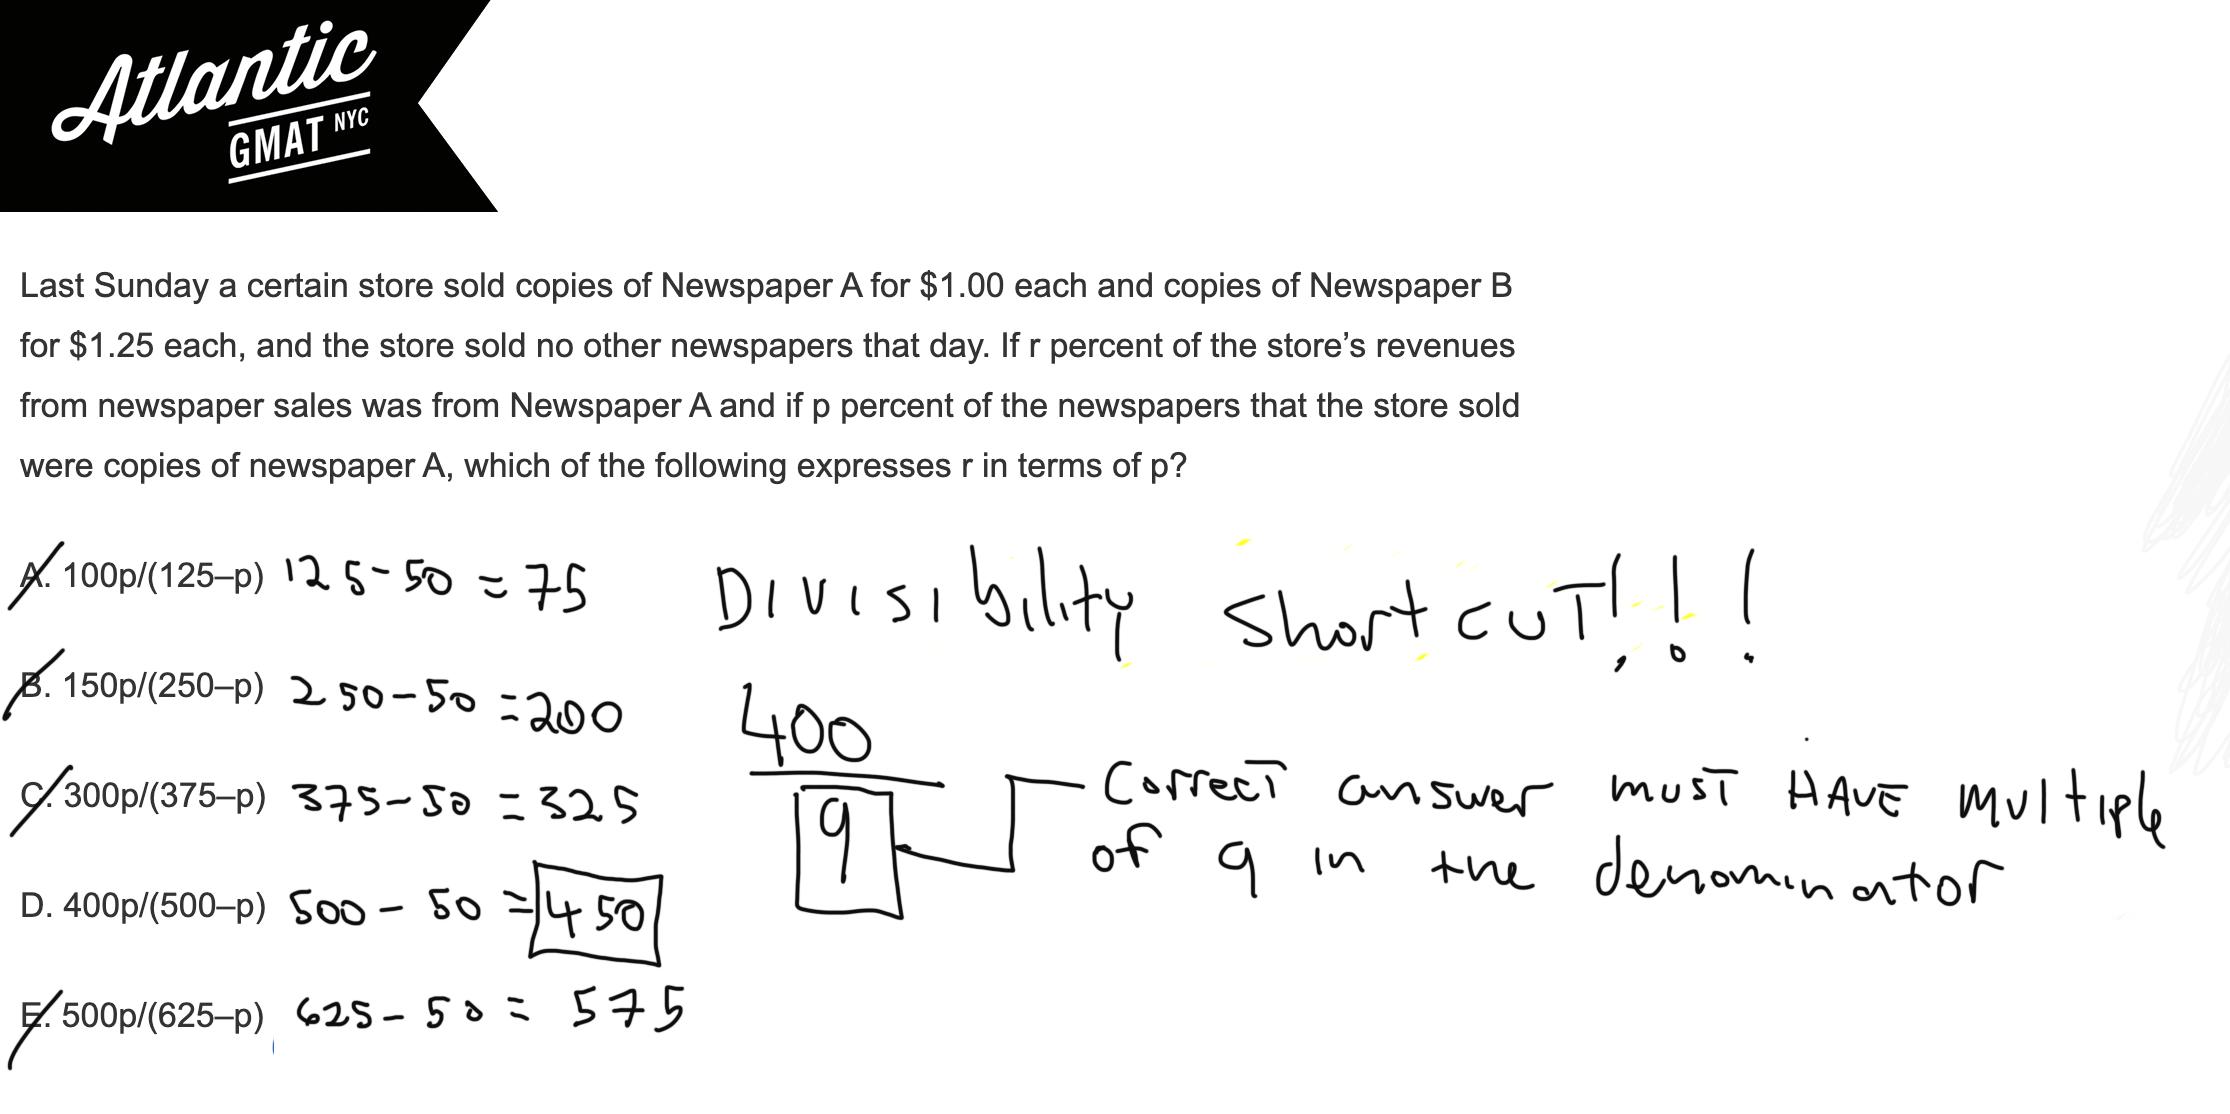 Last Sunday a certain store sold copies of Newspaper A for $1.00 each and copies of Newspaper B for $1.25 each, and the store sold no other newspapers that day GMAT Explanation Shortcut Diagram